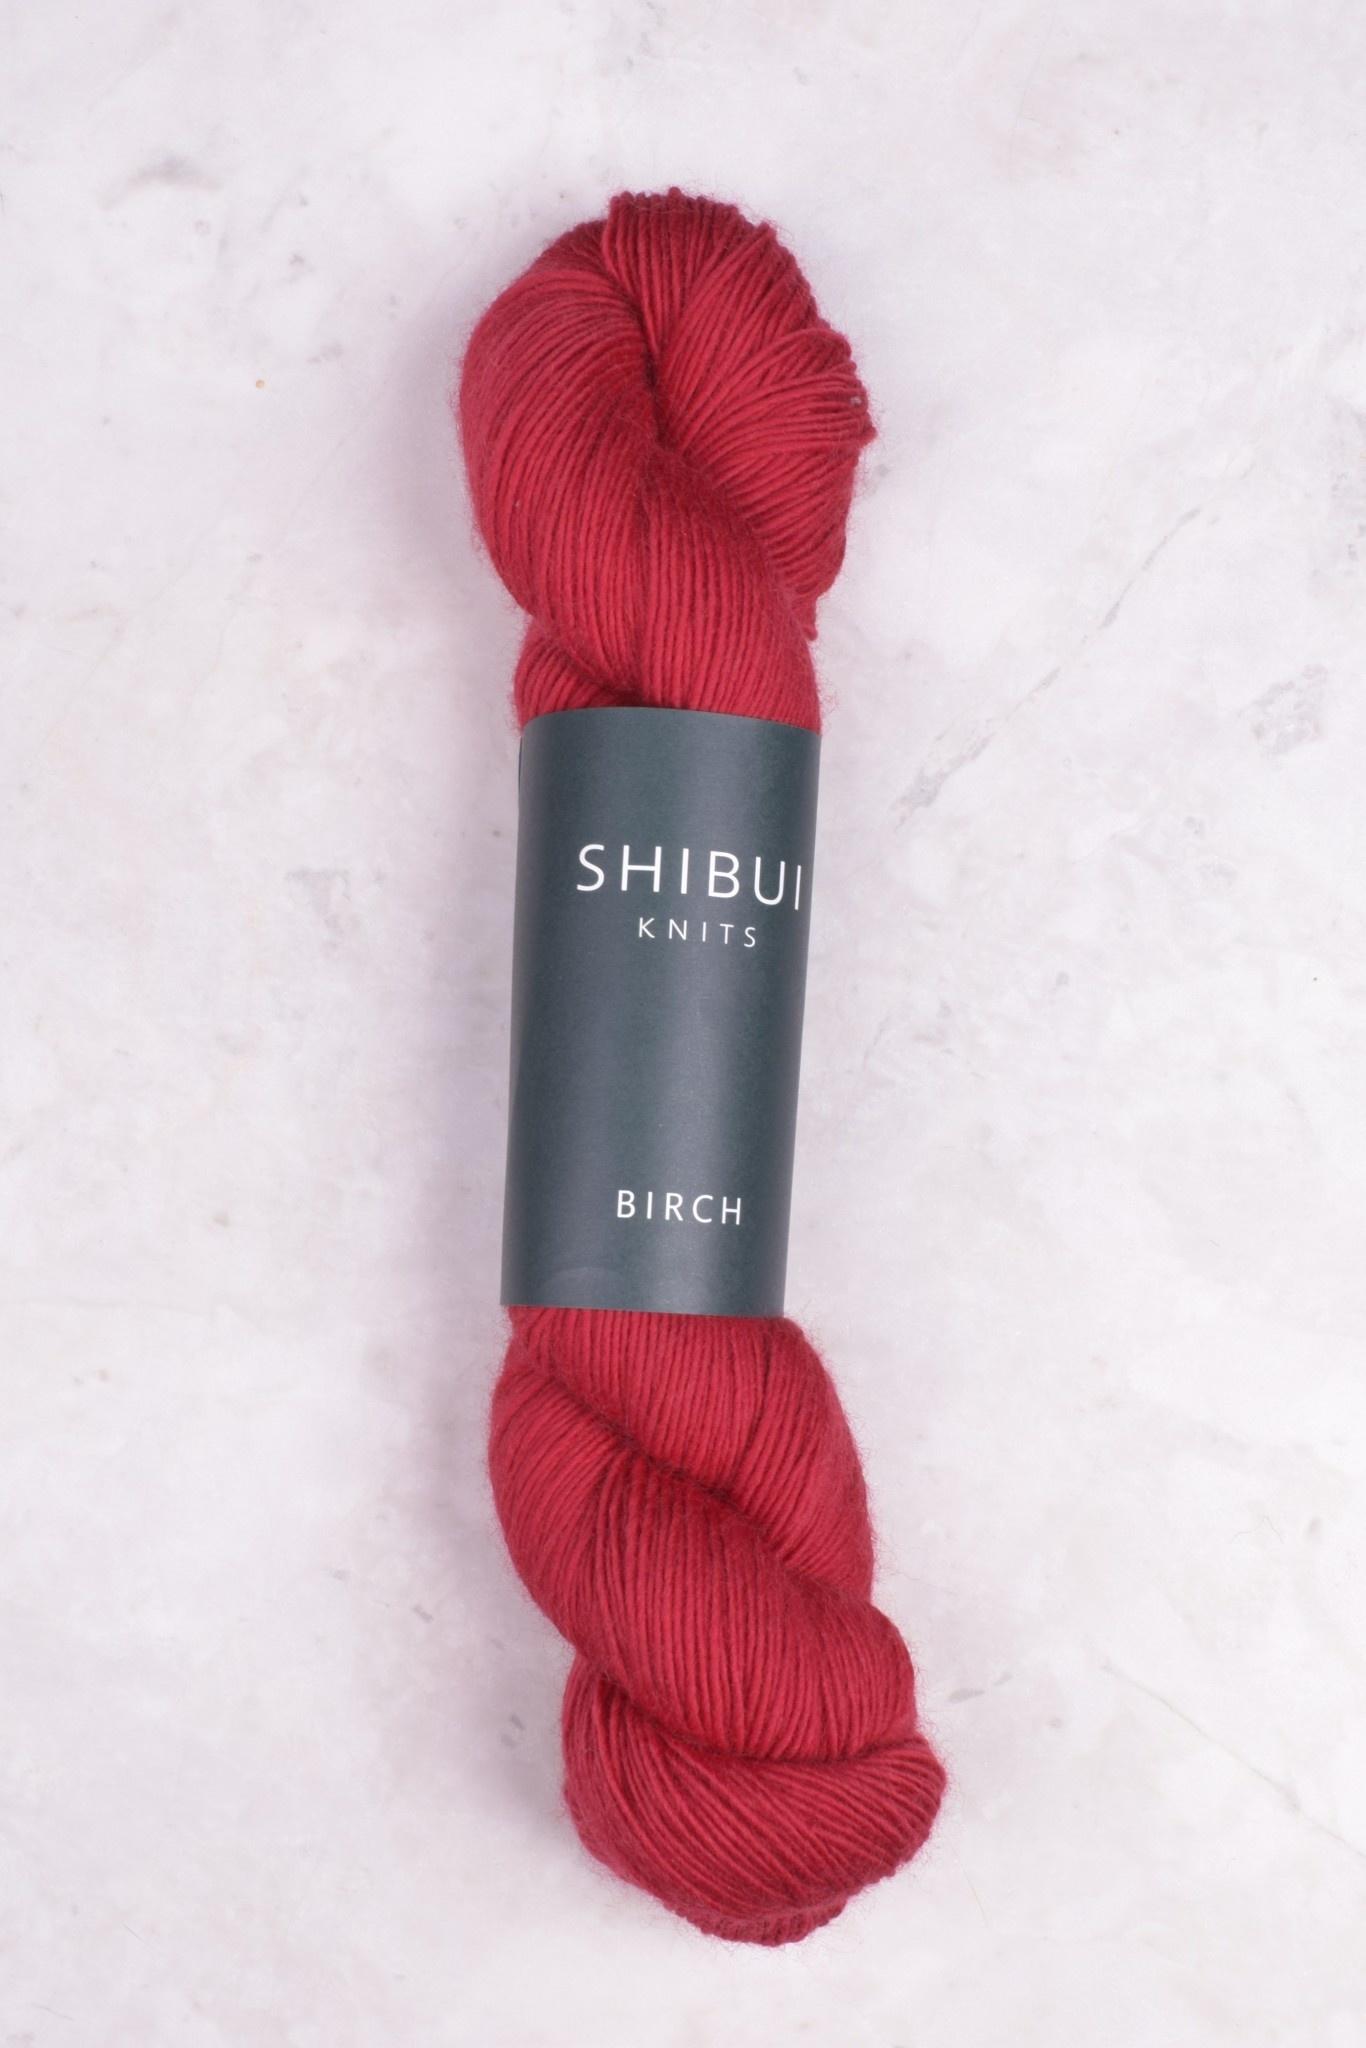 Image of Shibui Birch 2037 Tango (Discontinued)